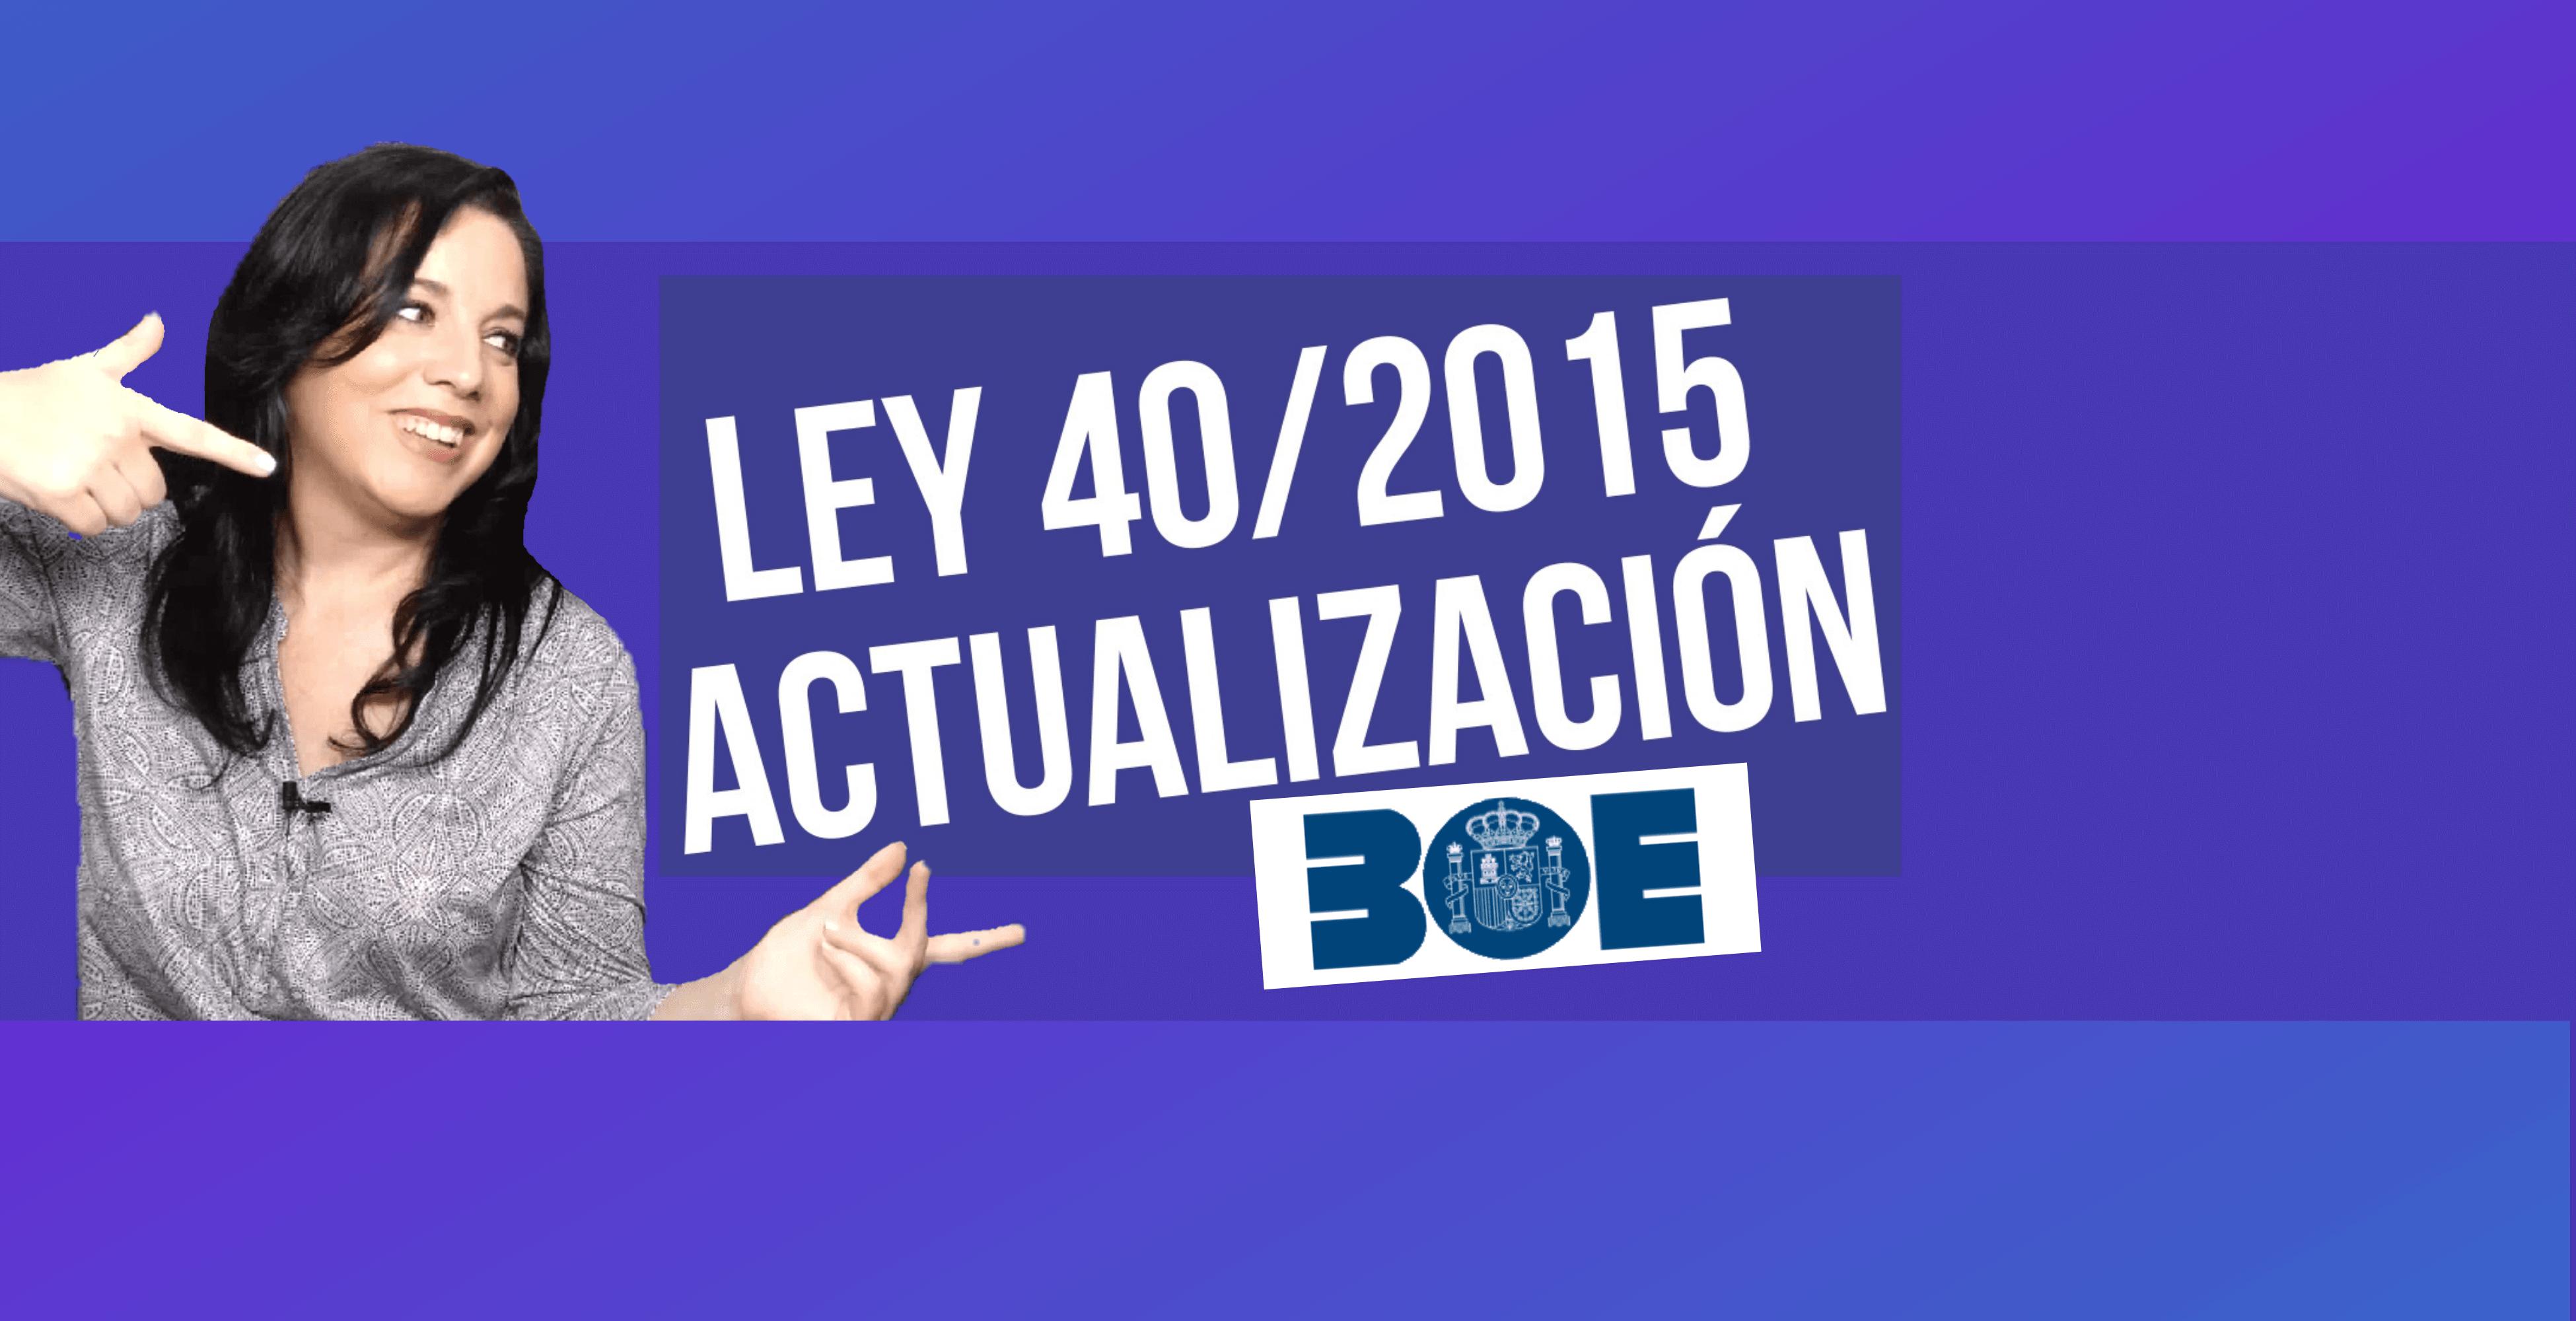 ley 40/2015 actualizada boe